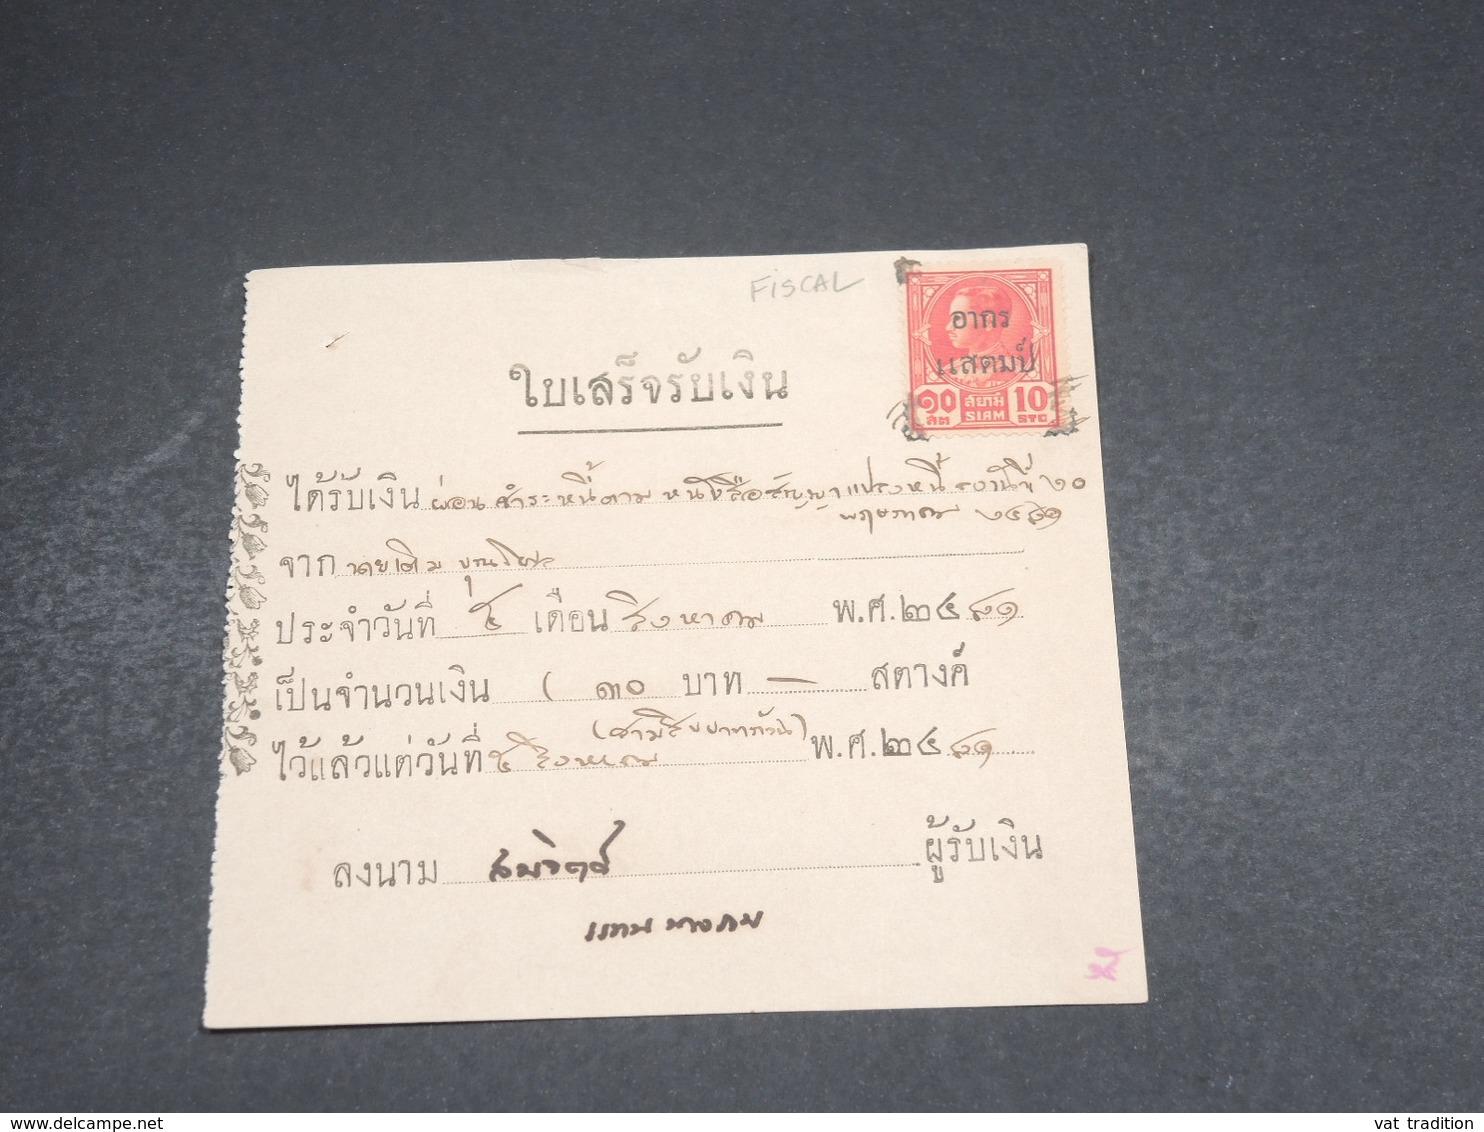 SIAM - Fiscal Sur Document - L 18774 - Siam